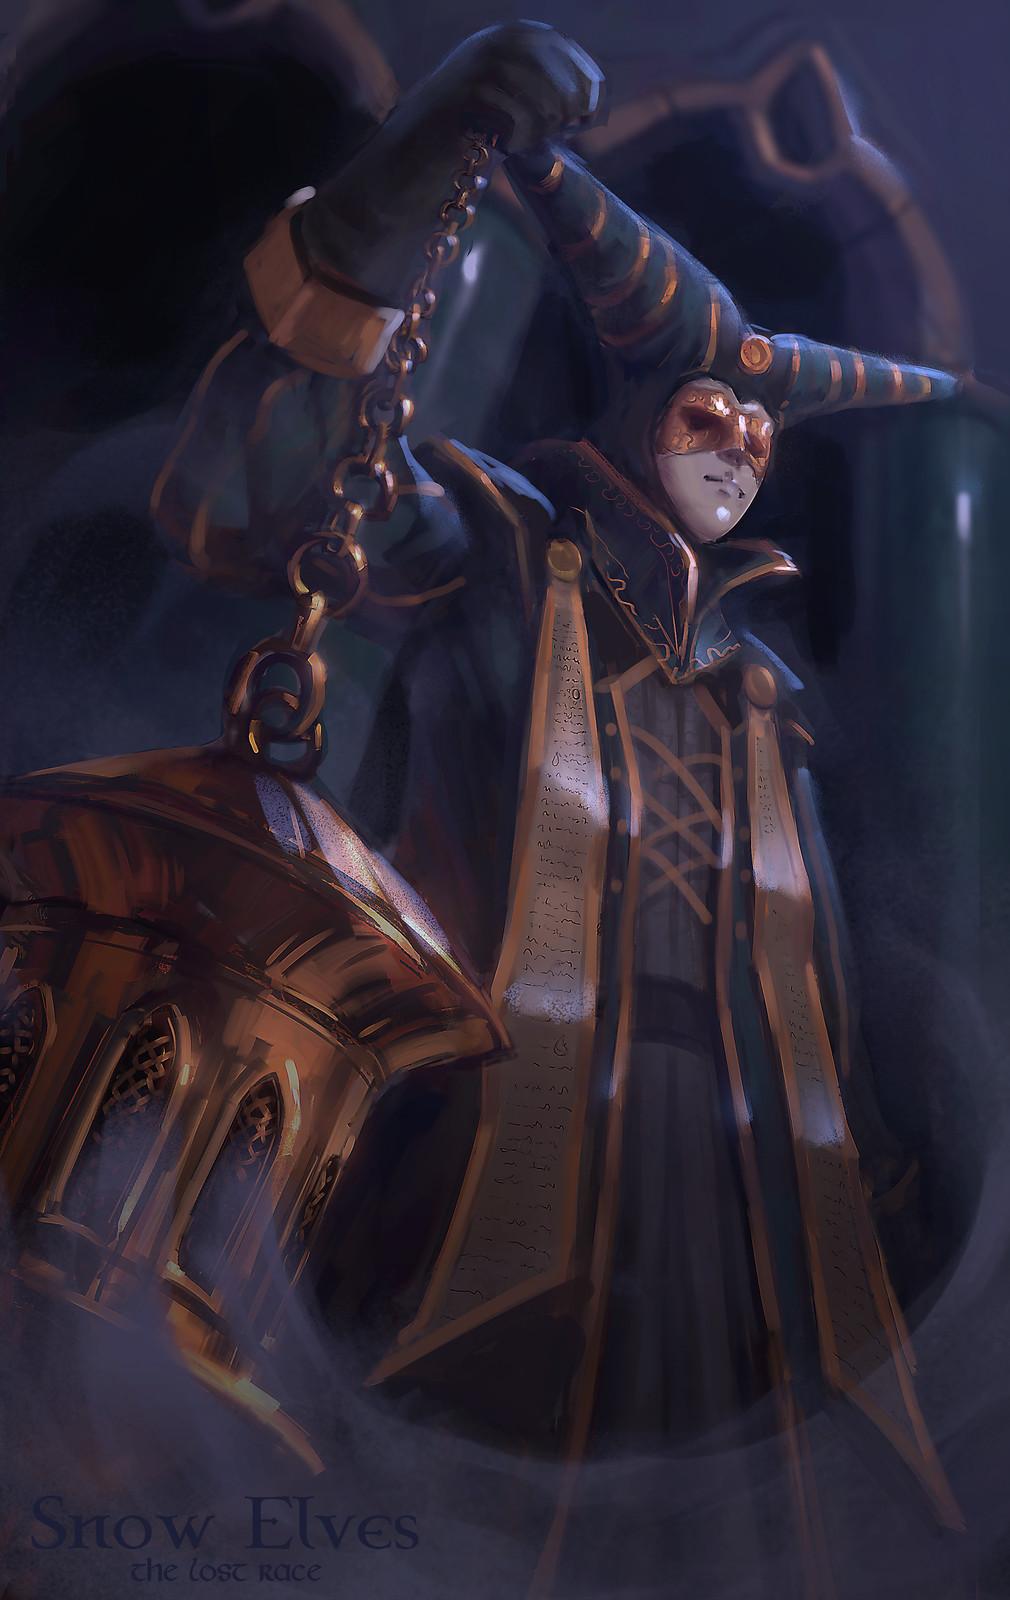 Snow Elves - Mephrin priest